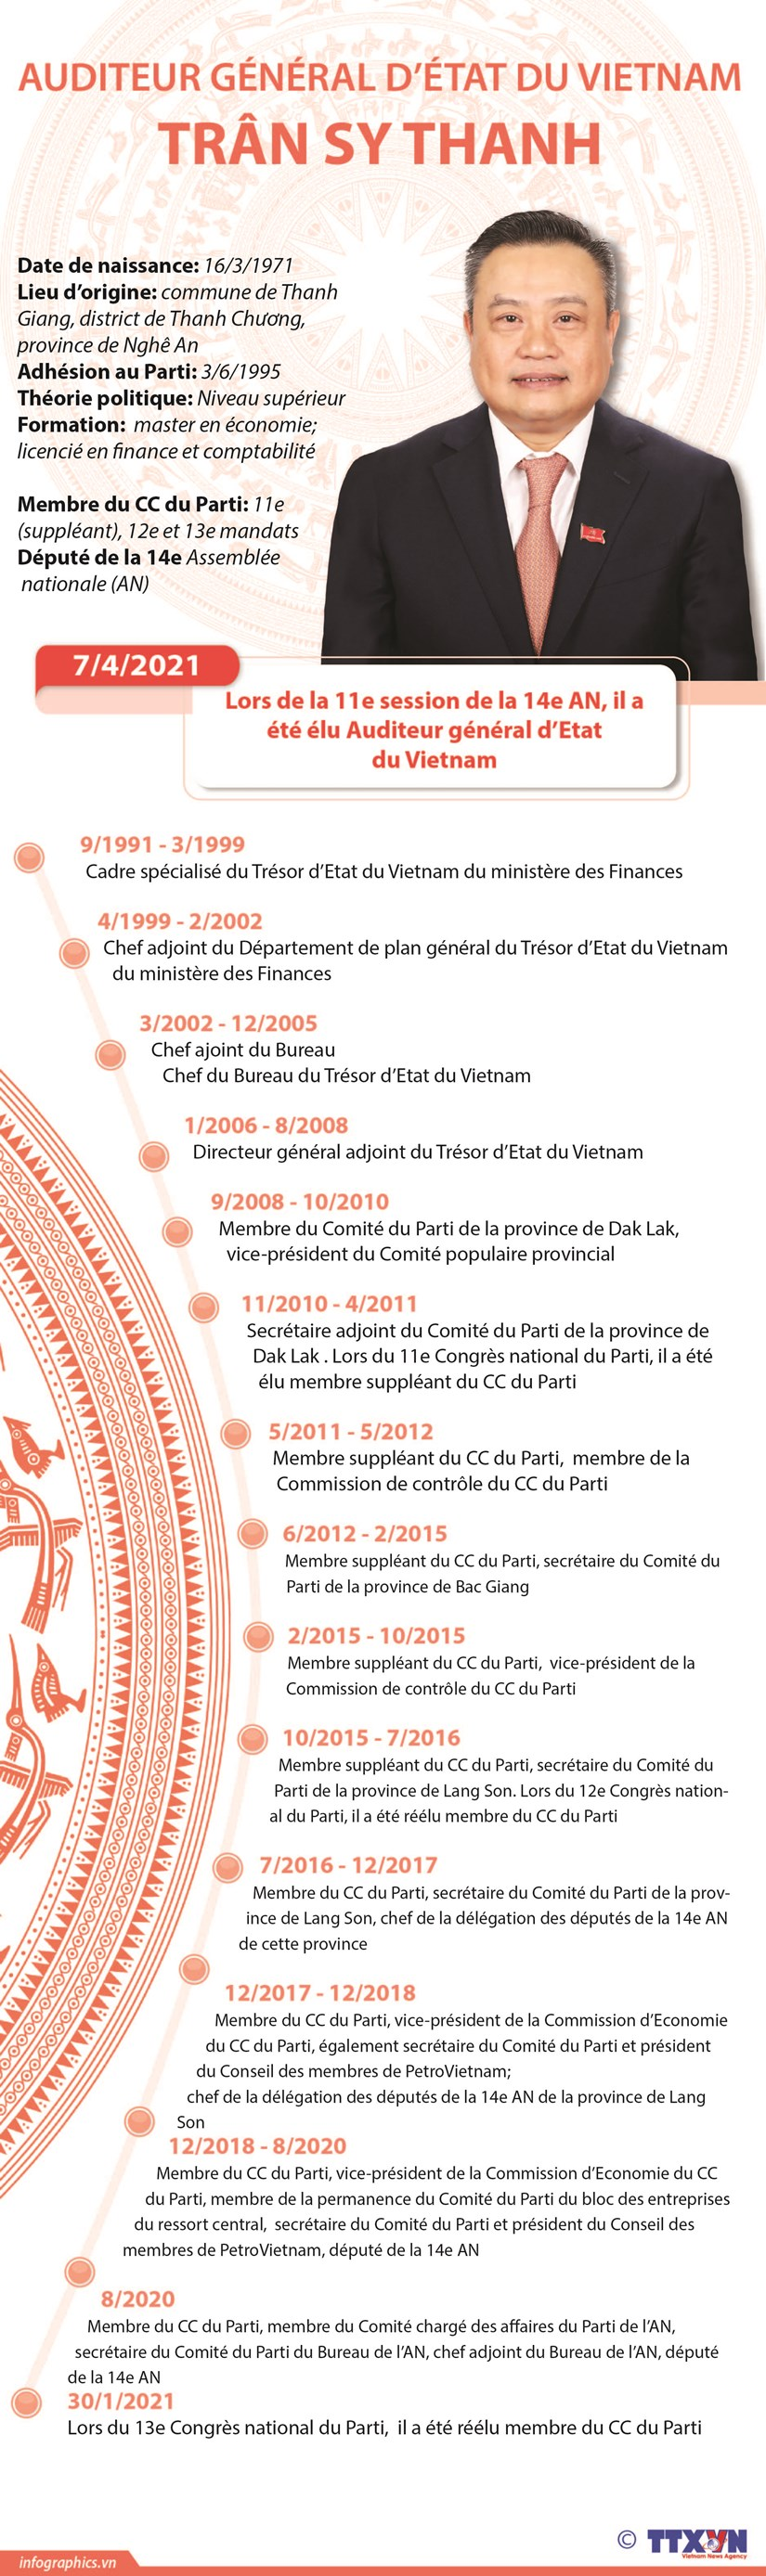 Auditeur general d'Etat du Vietnam, Tran Sy Thanh hinh anh 1